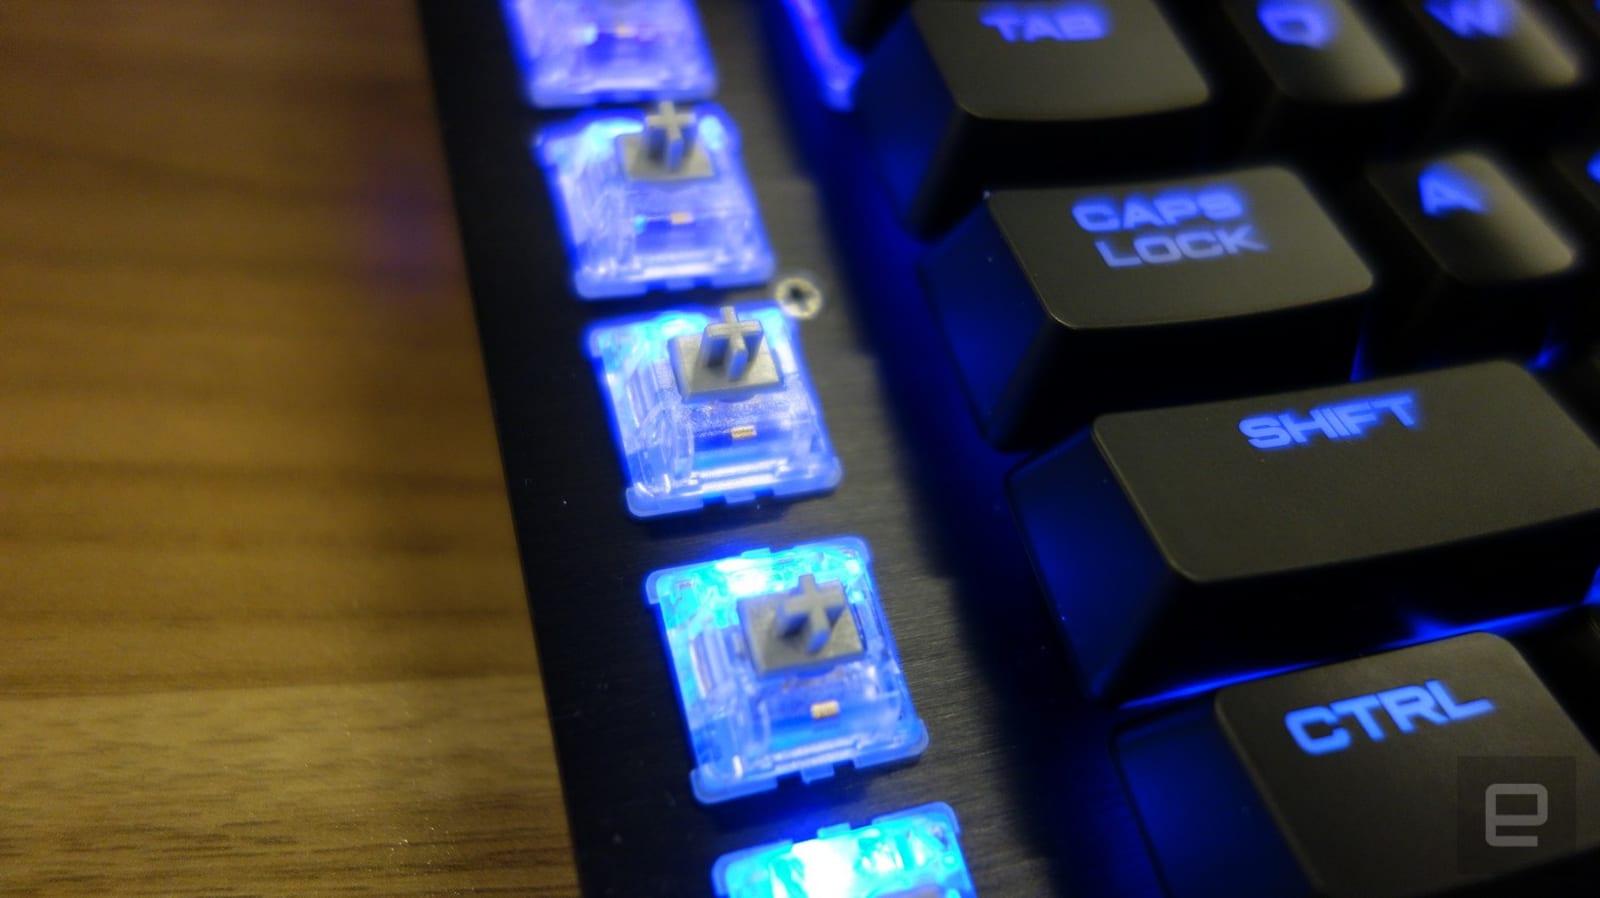 Corsair's new K95 gaming keyboard is surprisingly classy